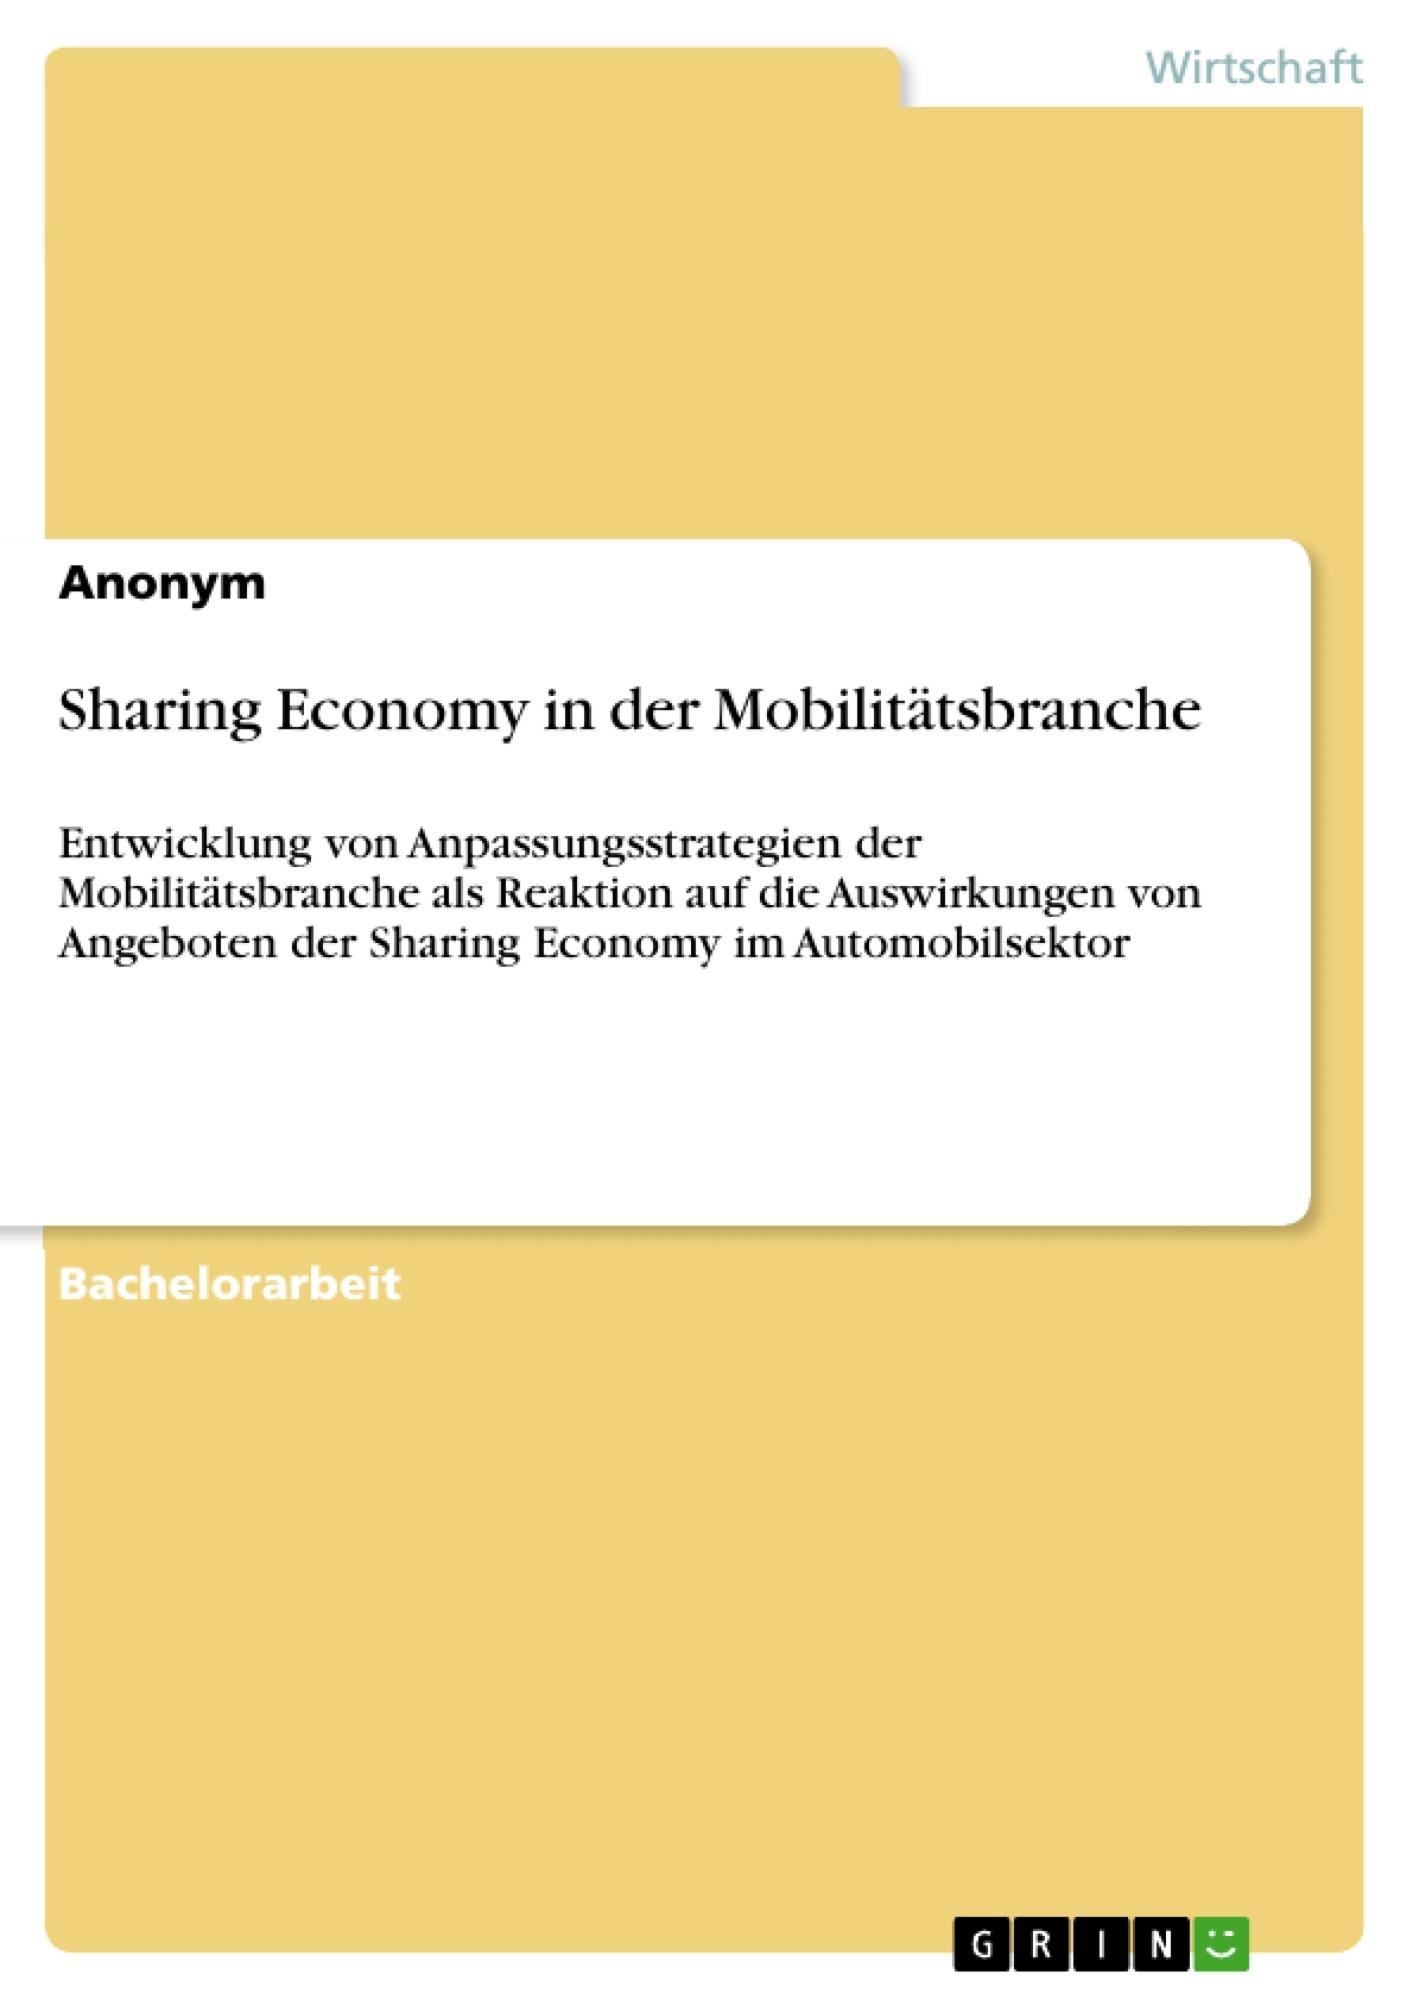 Titel: Sharing Economy in der Mobilitätsbranche